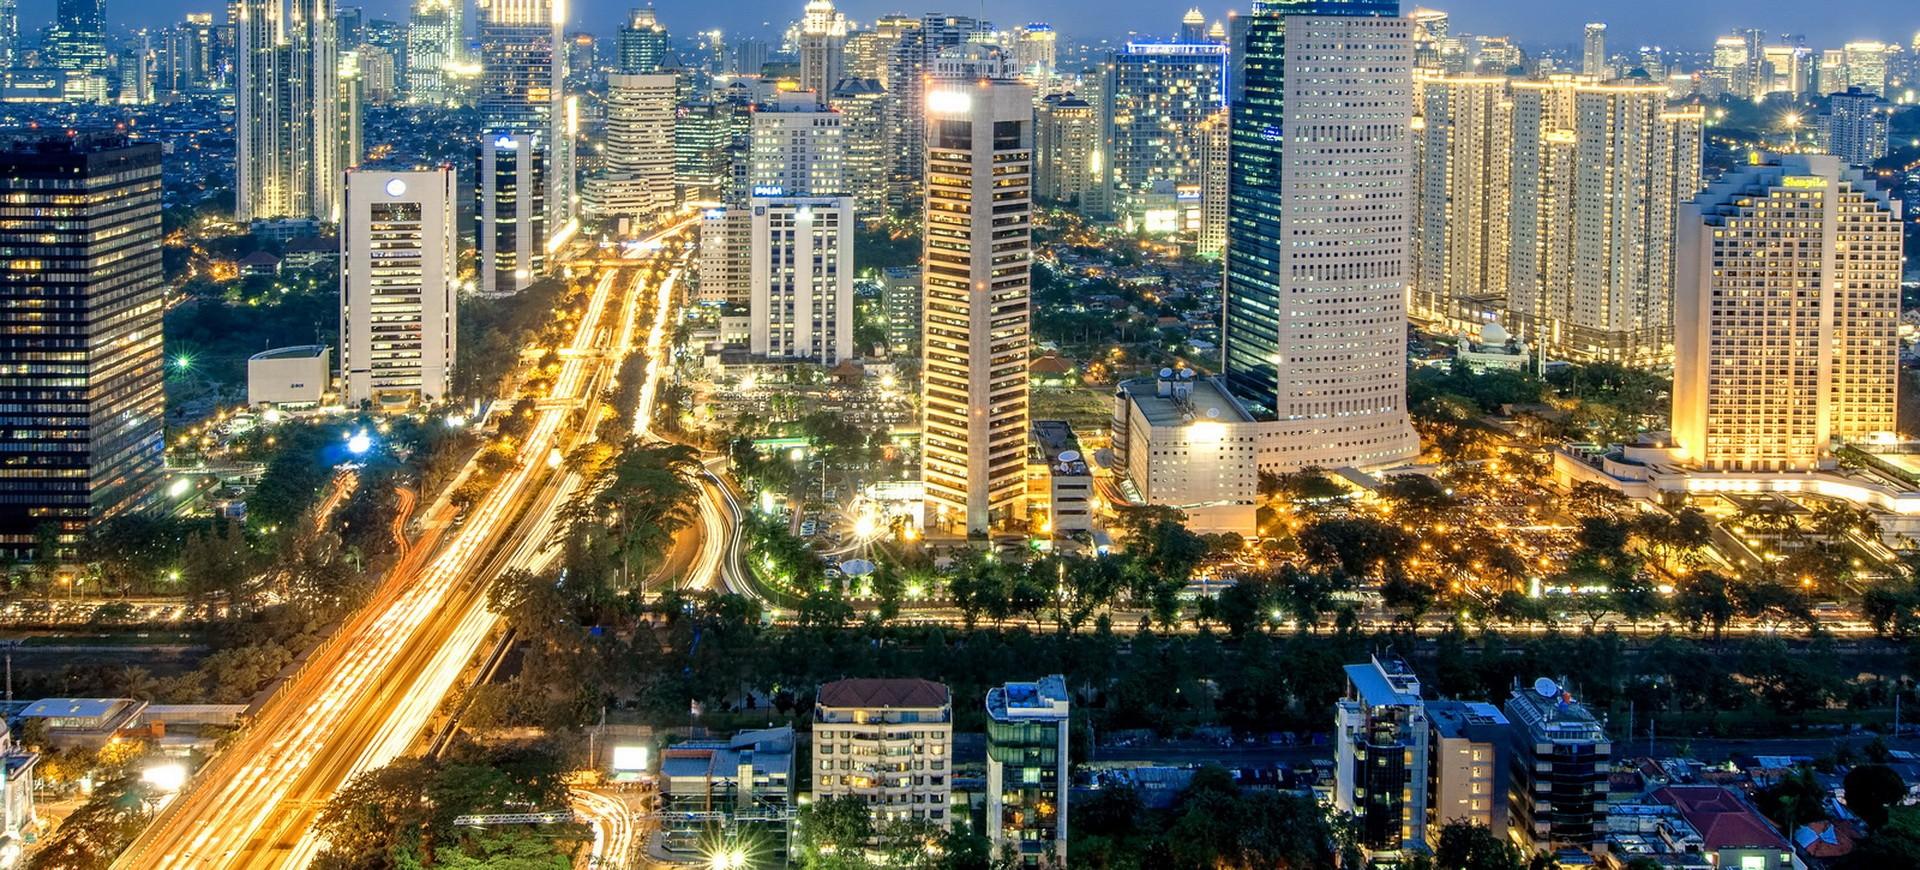 Skyline à Java en Indonésie